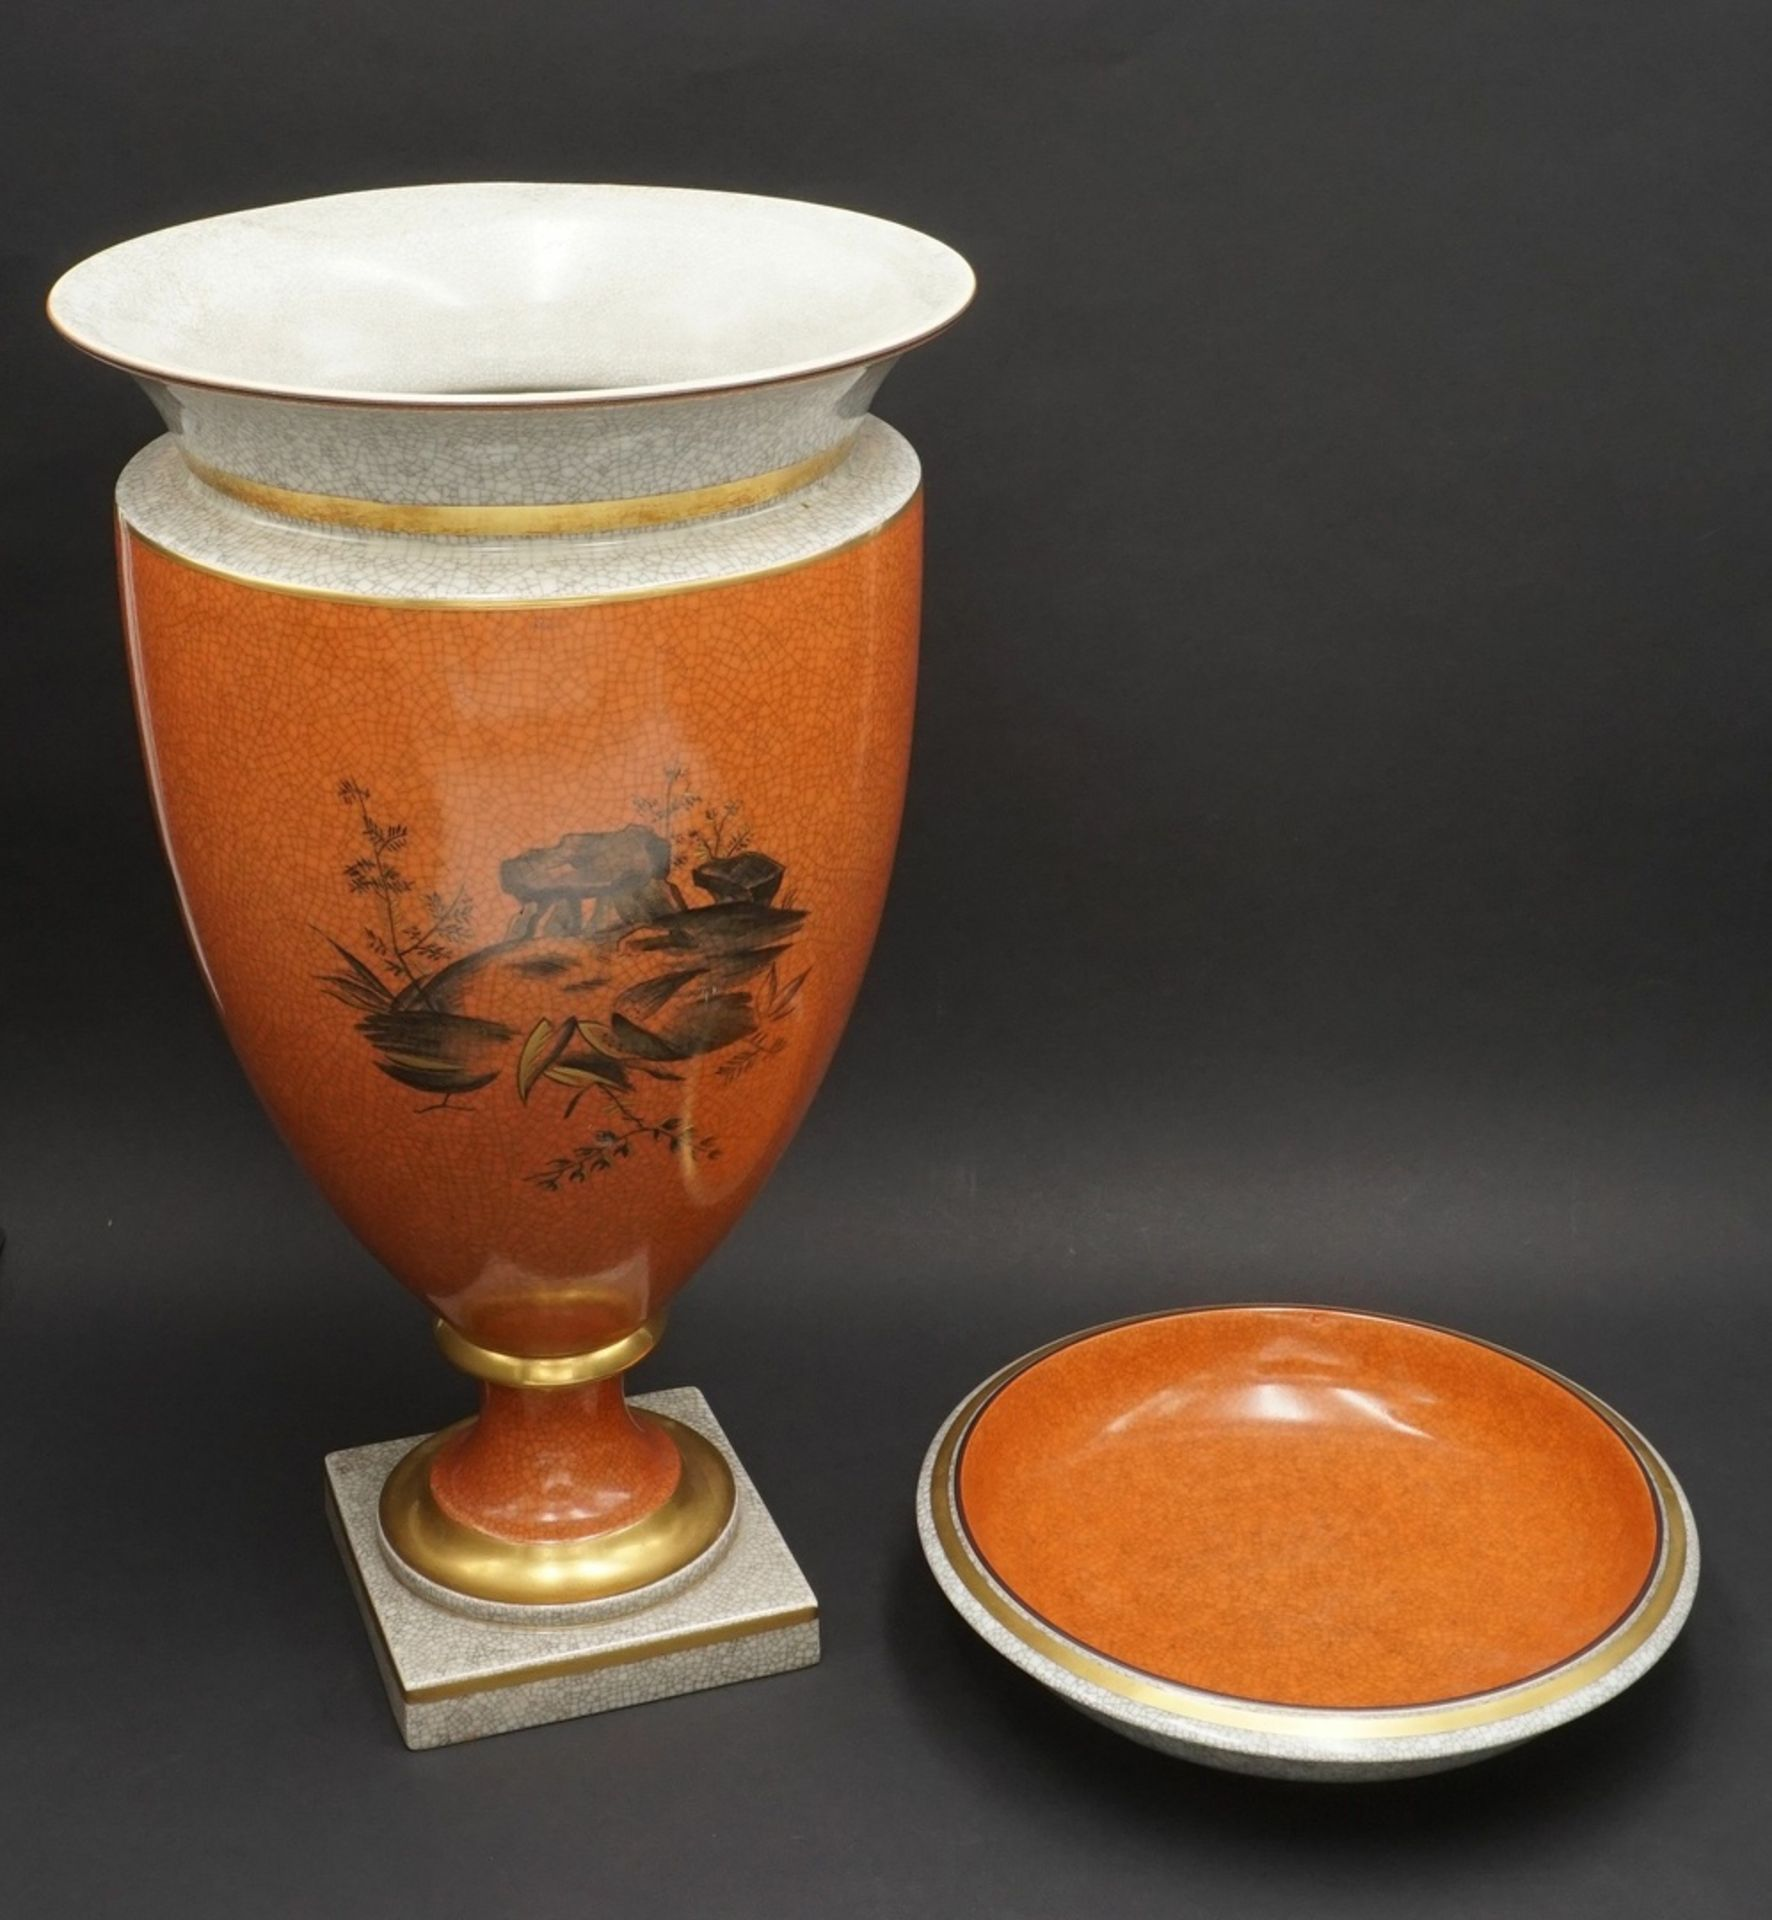 Royal Copenhagen große Krakelee Vase mit Schale, um 1950 - Bild 2 aus 8